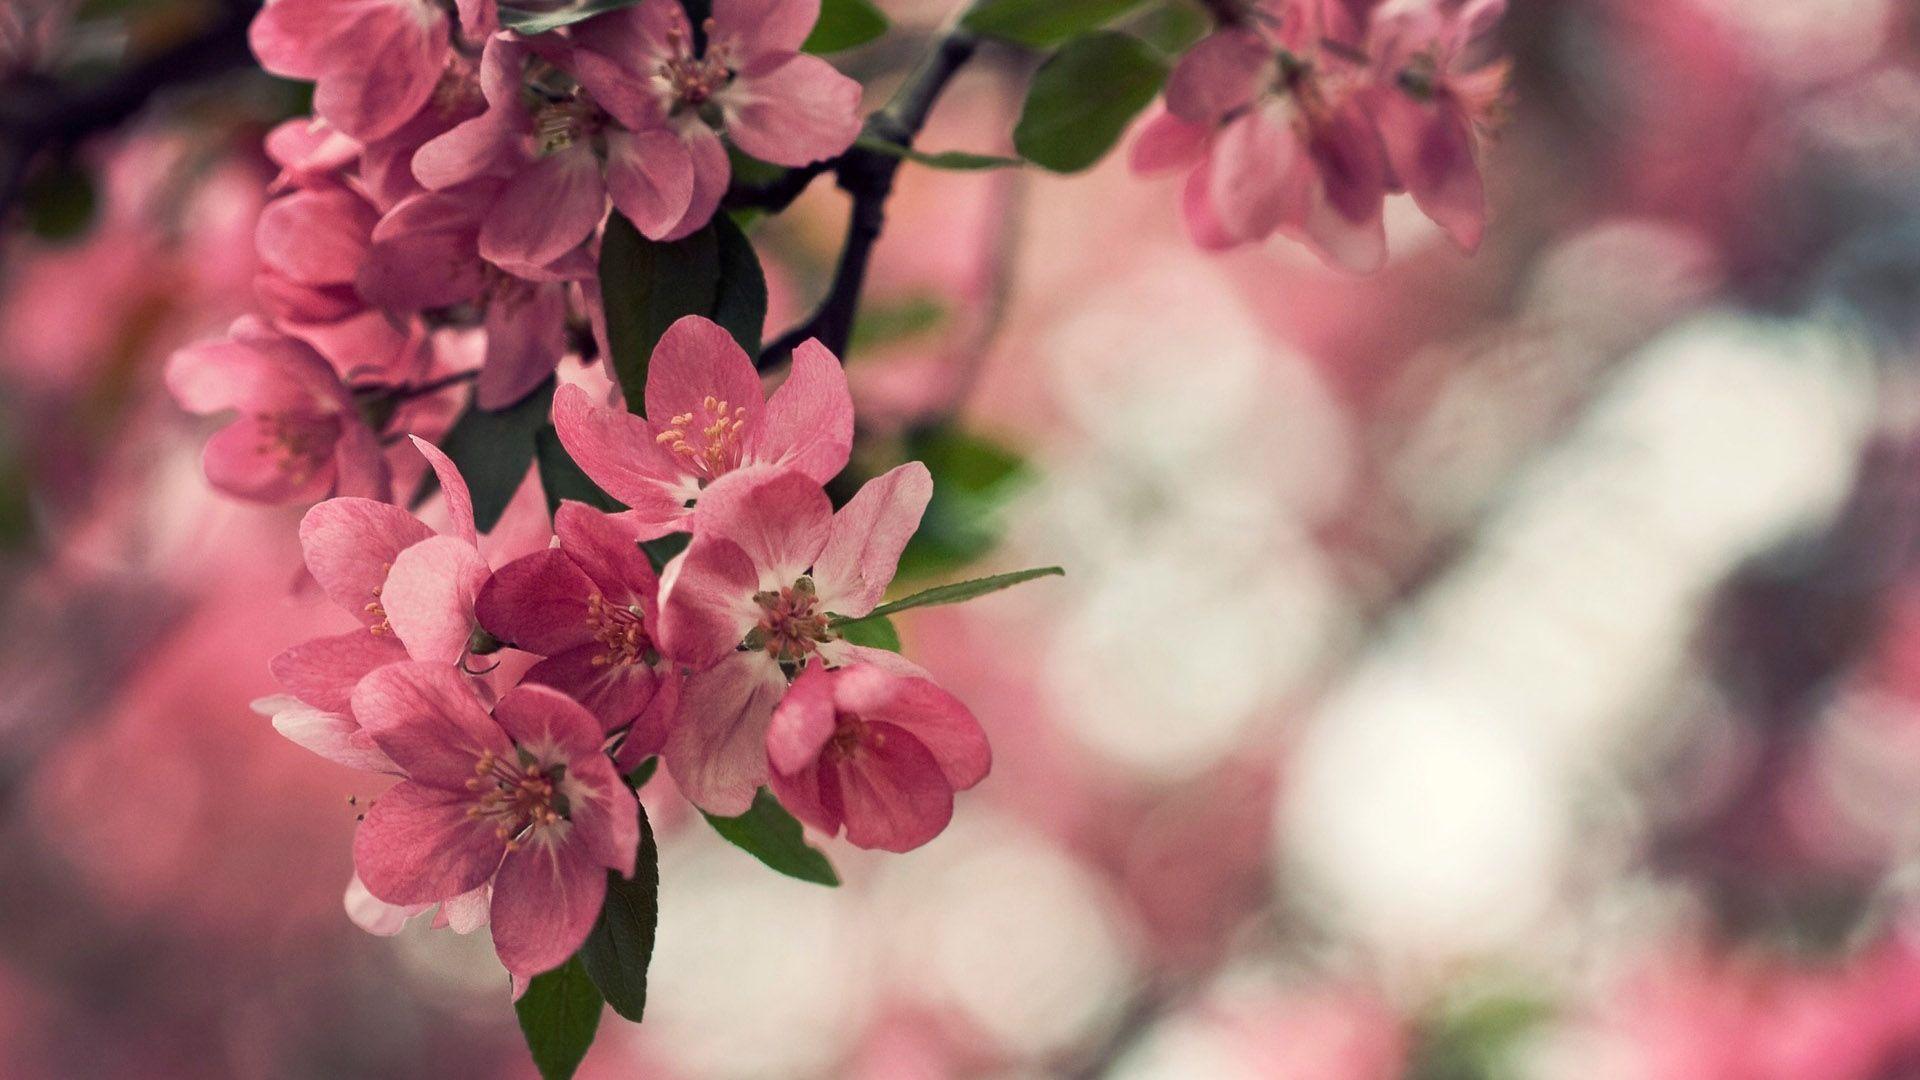 peach flowers wide hd wallpaper for desktop background download 1920x1080